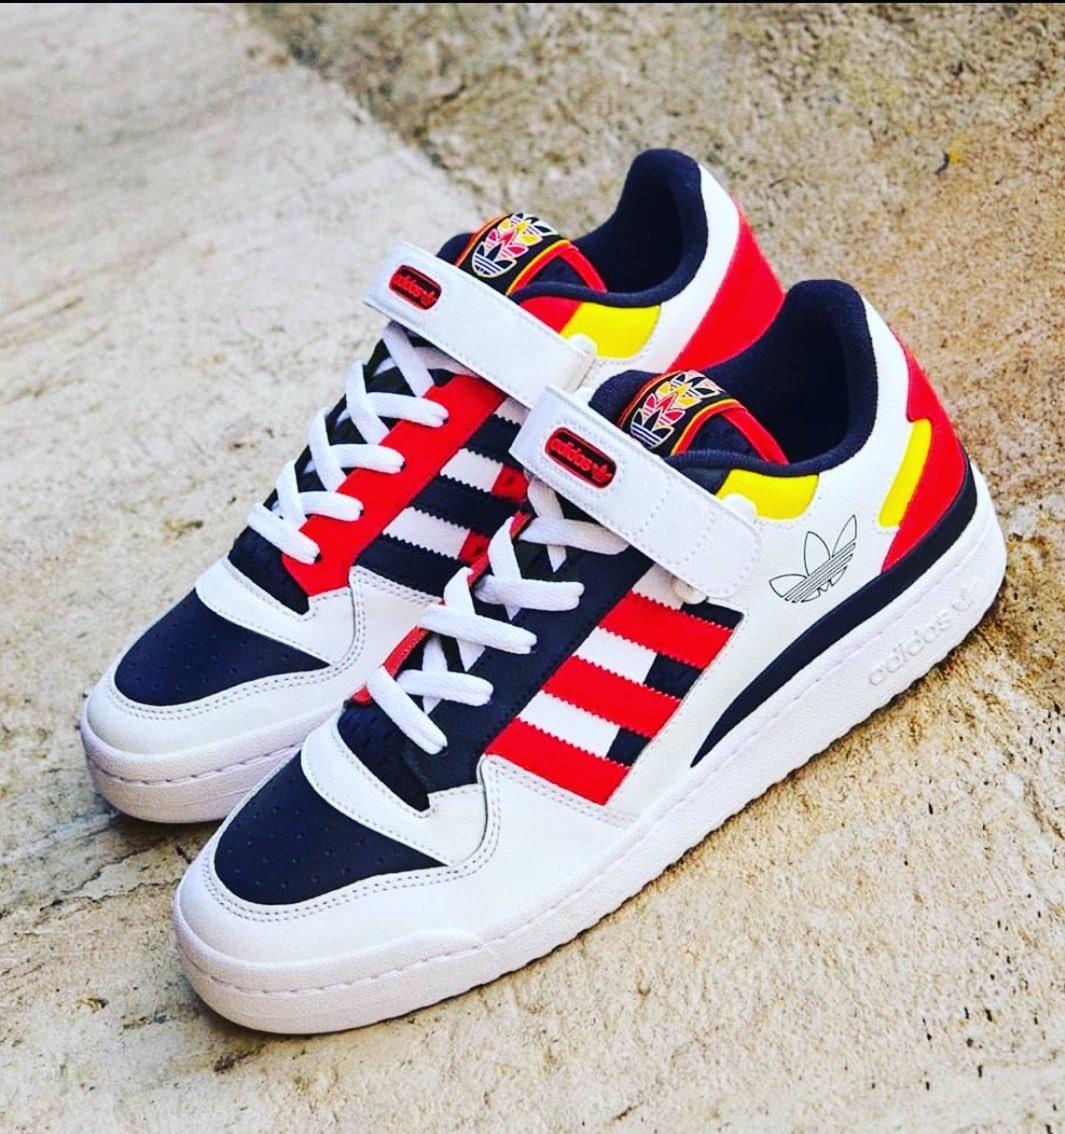 Adidas Forum 9